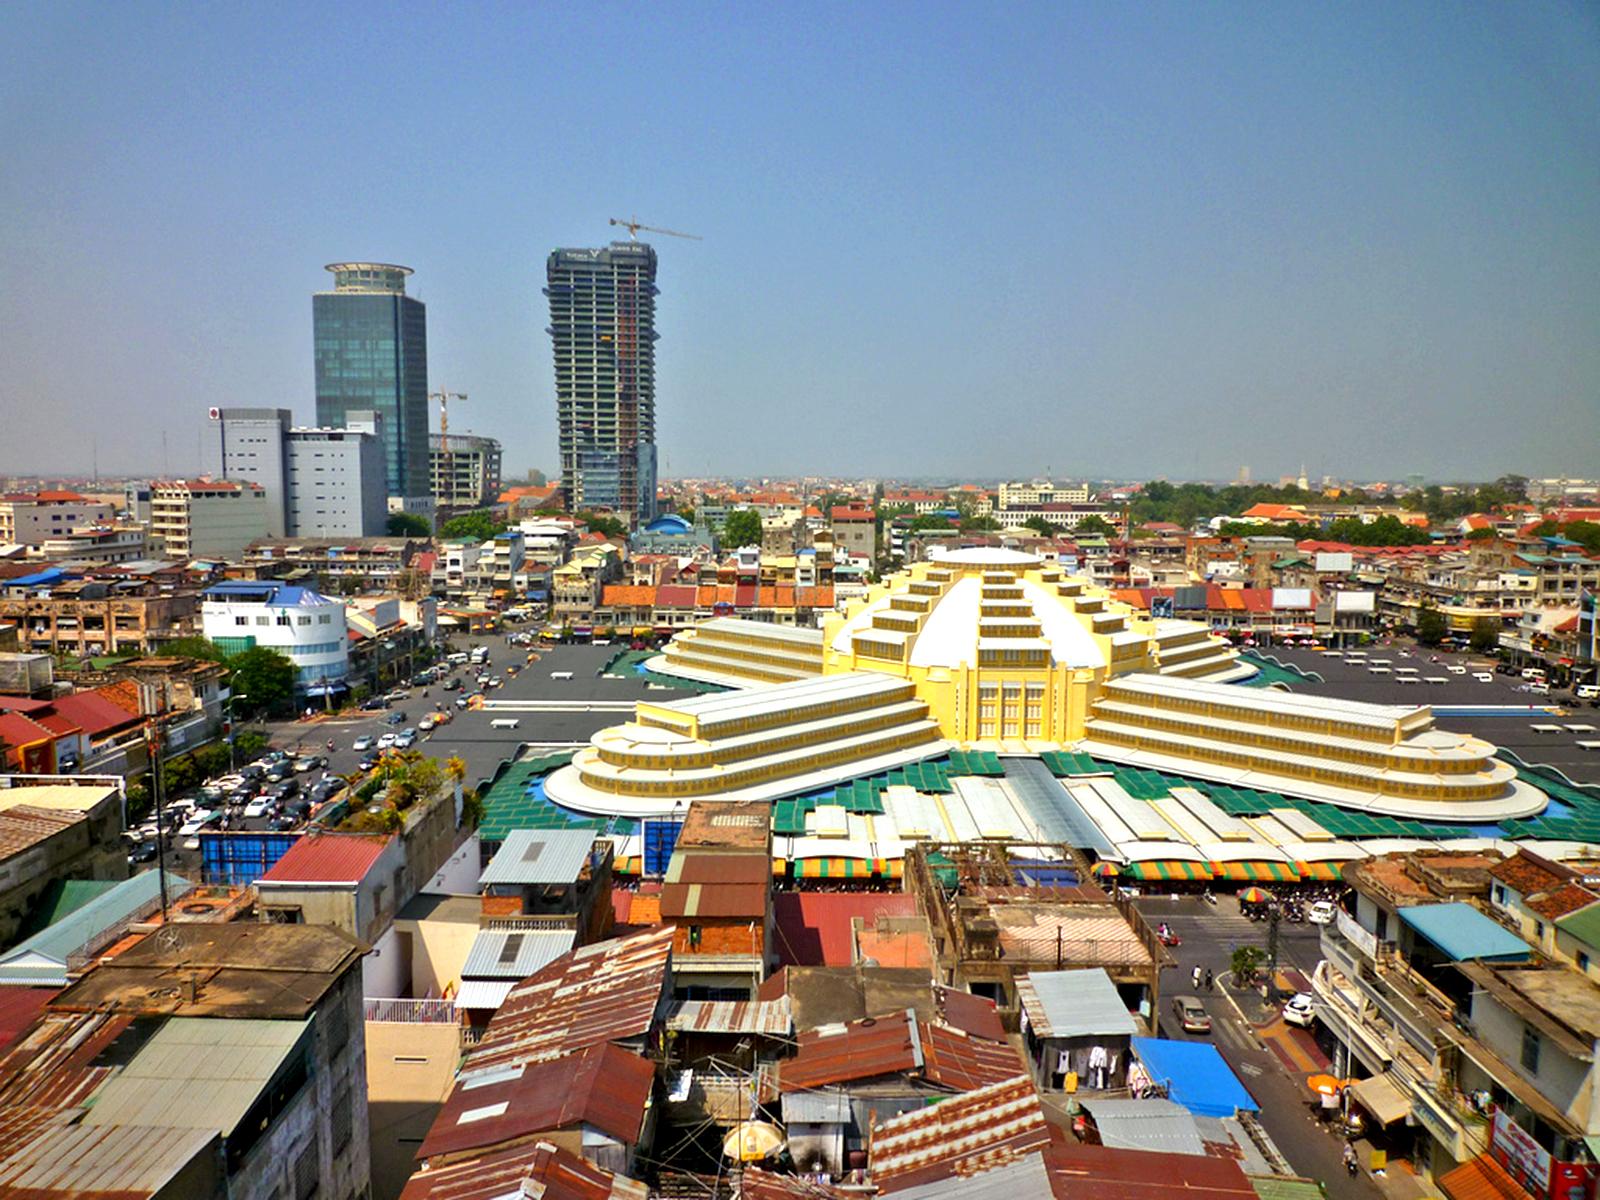 Phnom Penh the Capital of Cambodia